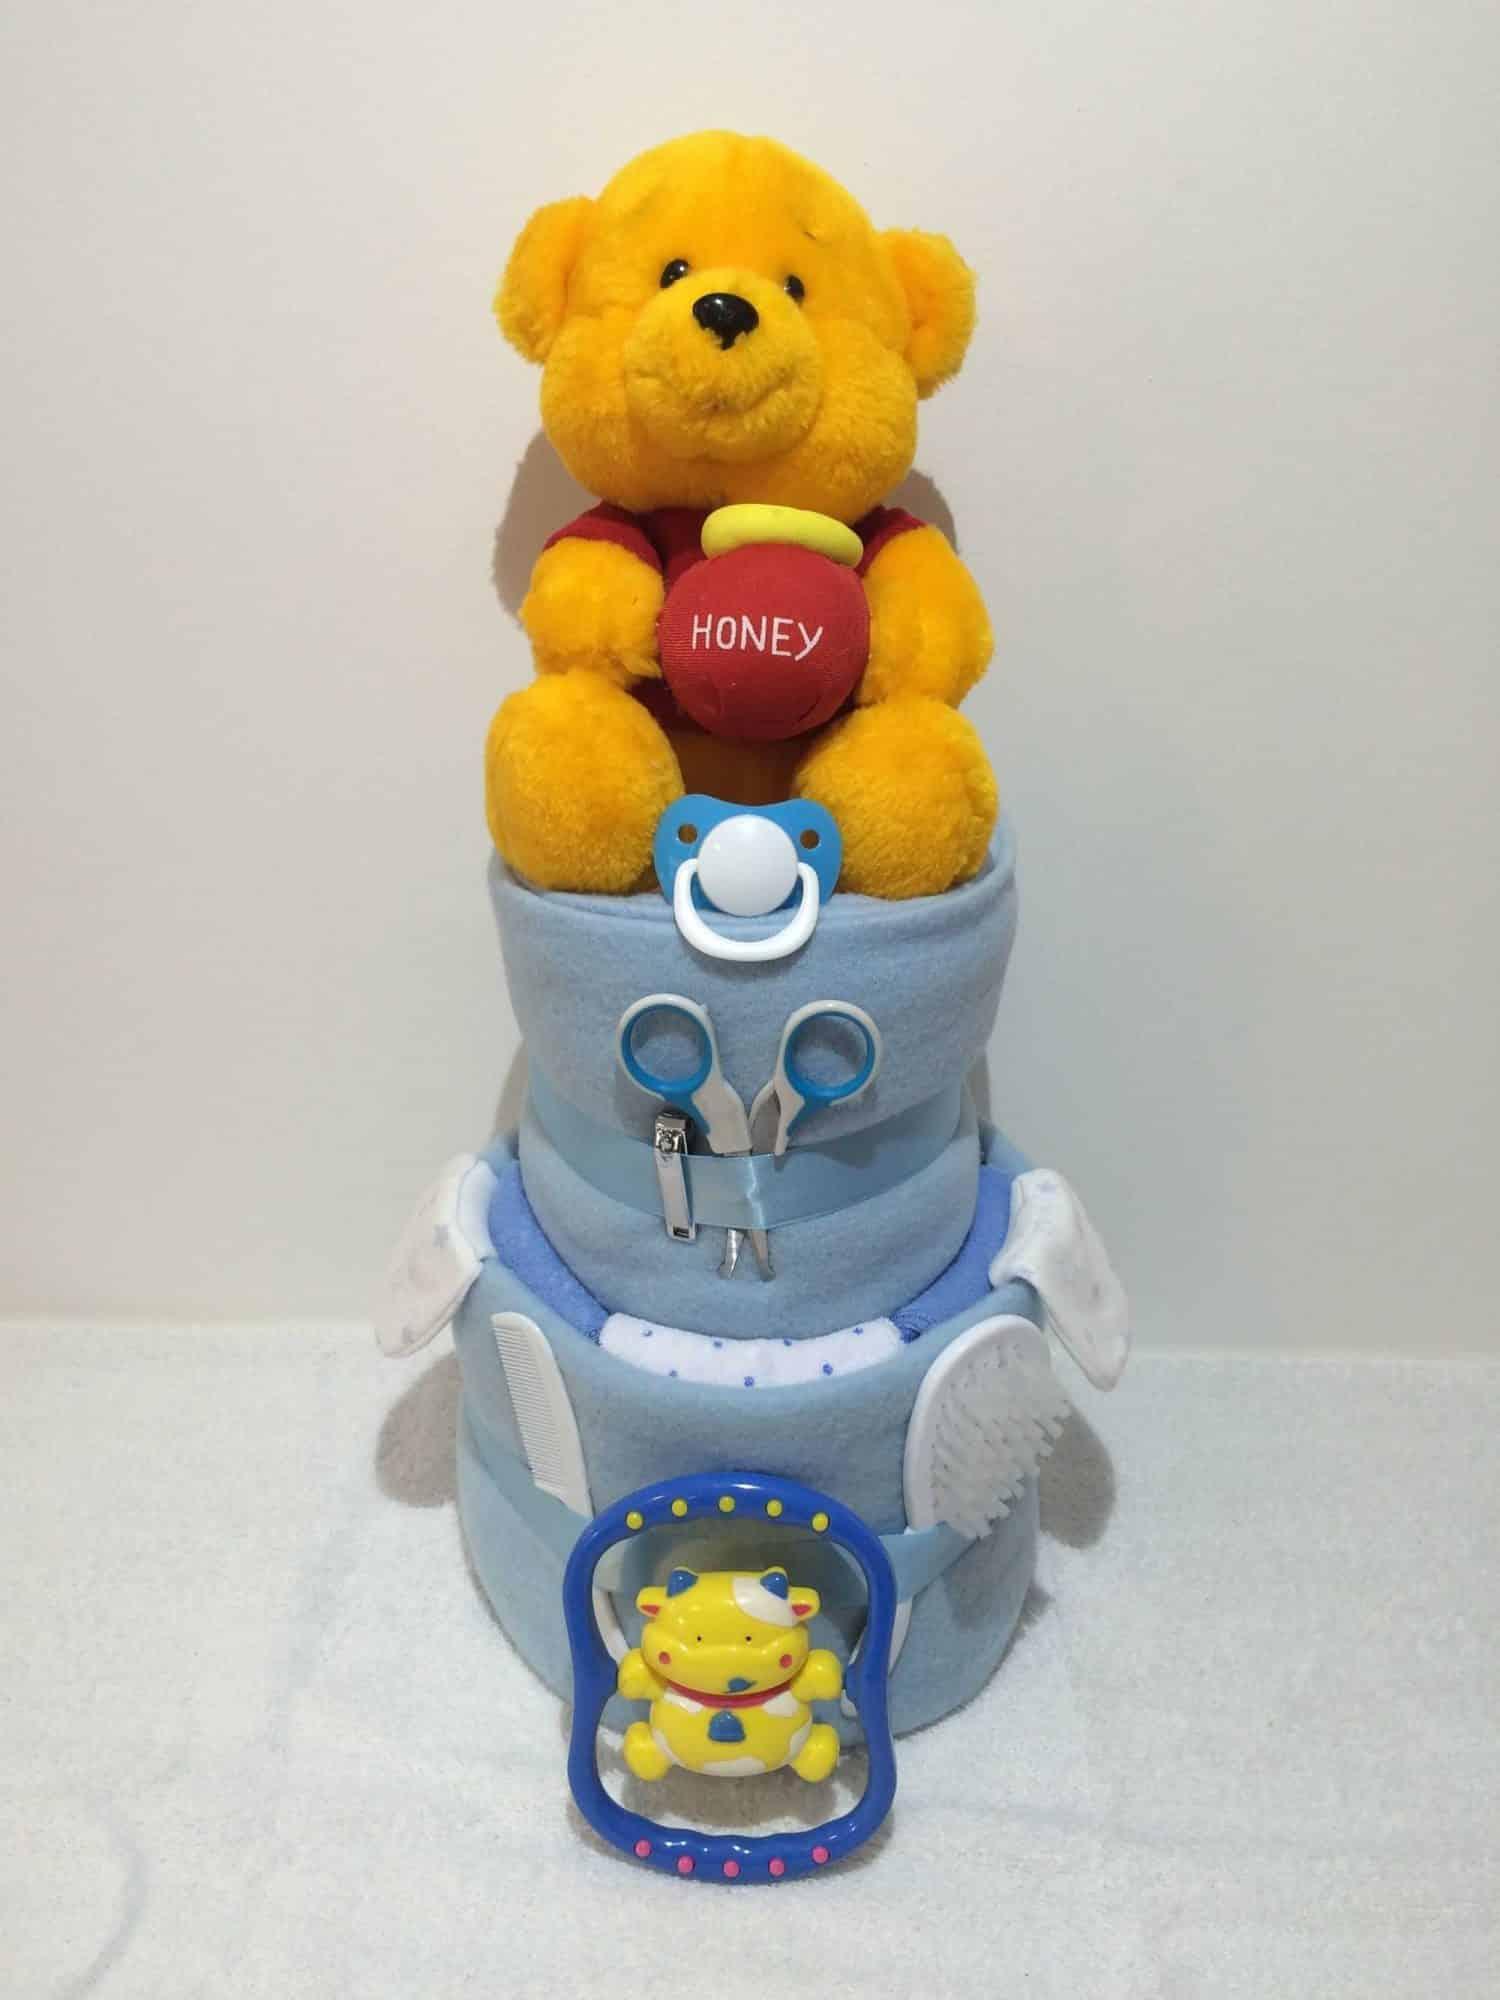 a62474243ee9 Honey Pot Winnie The Pooh Teddy Bear Nappy Cake - Jan s Hampers ...